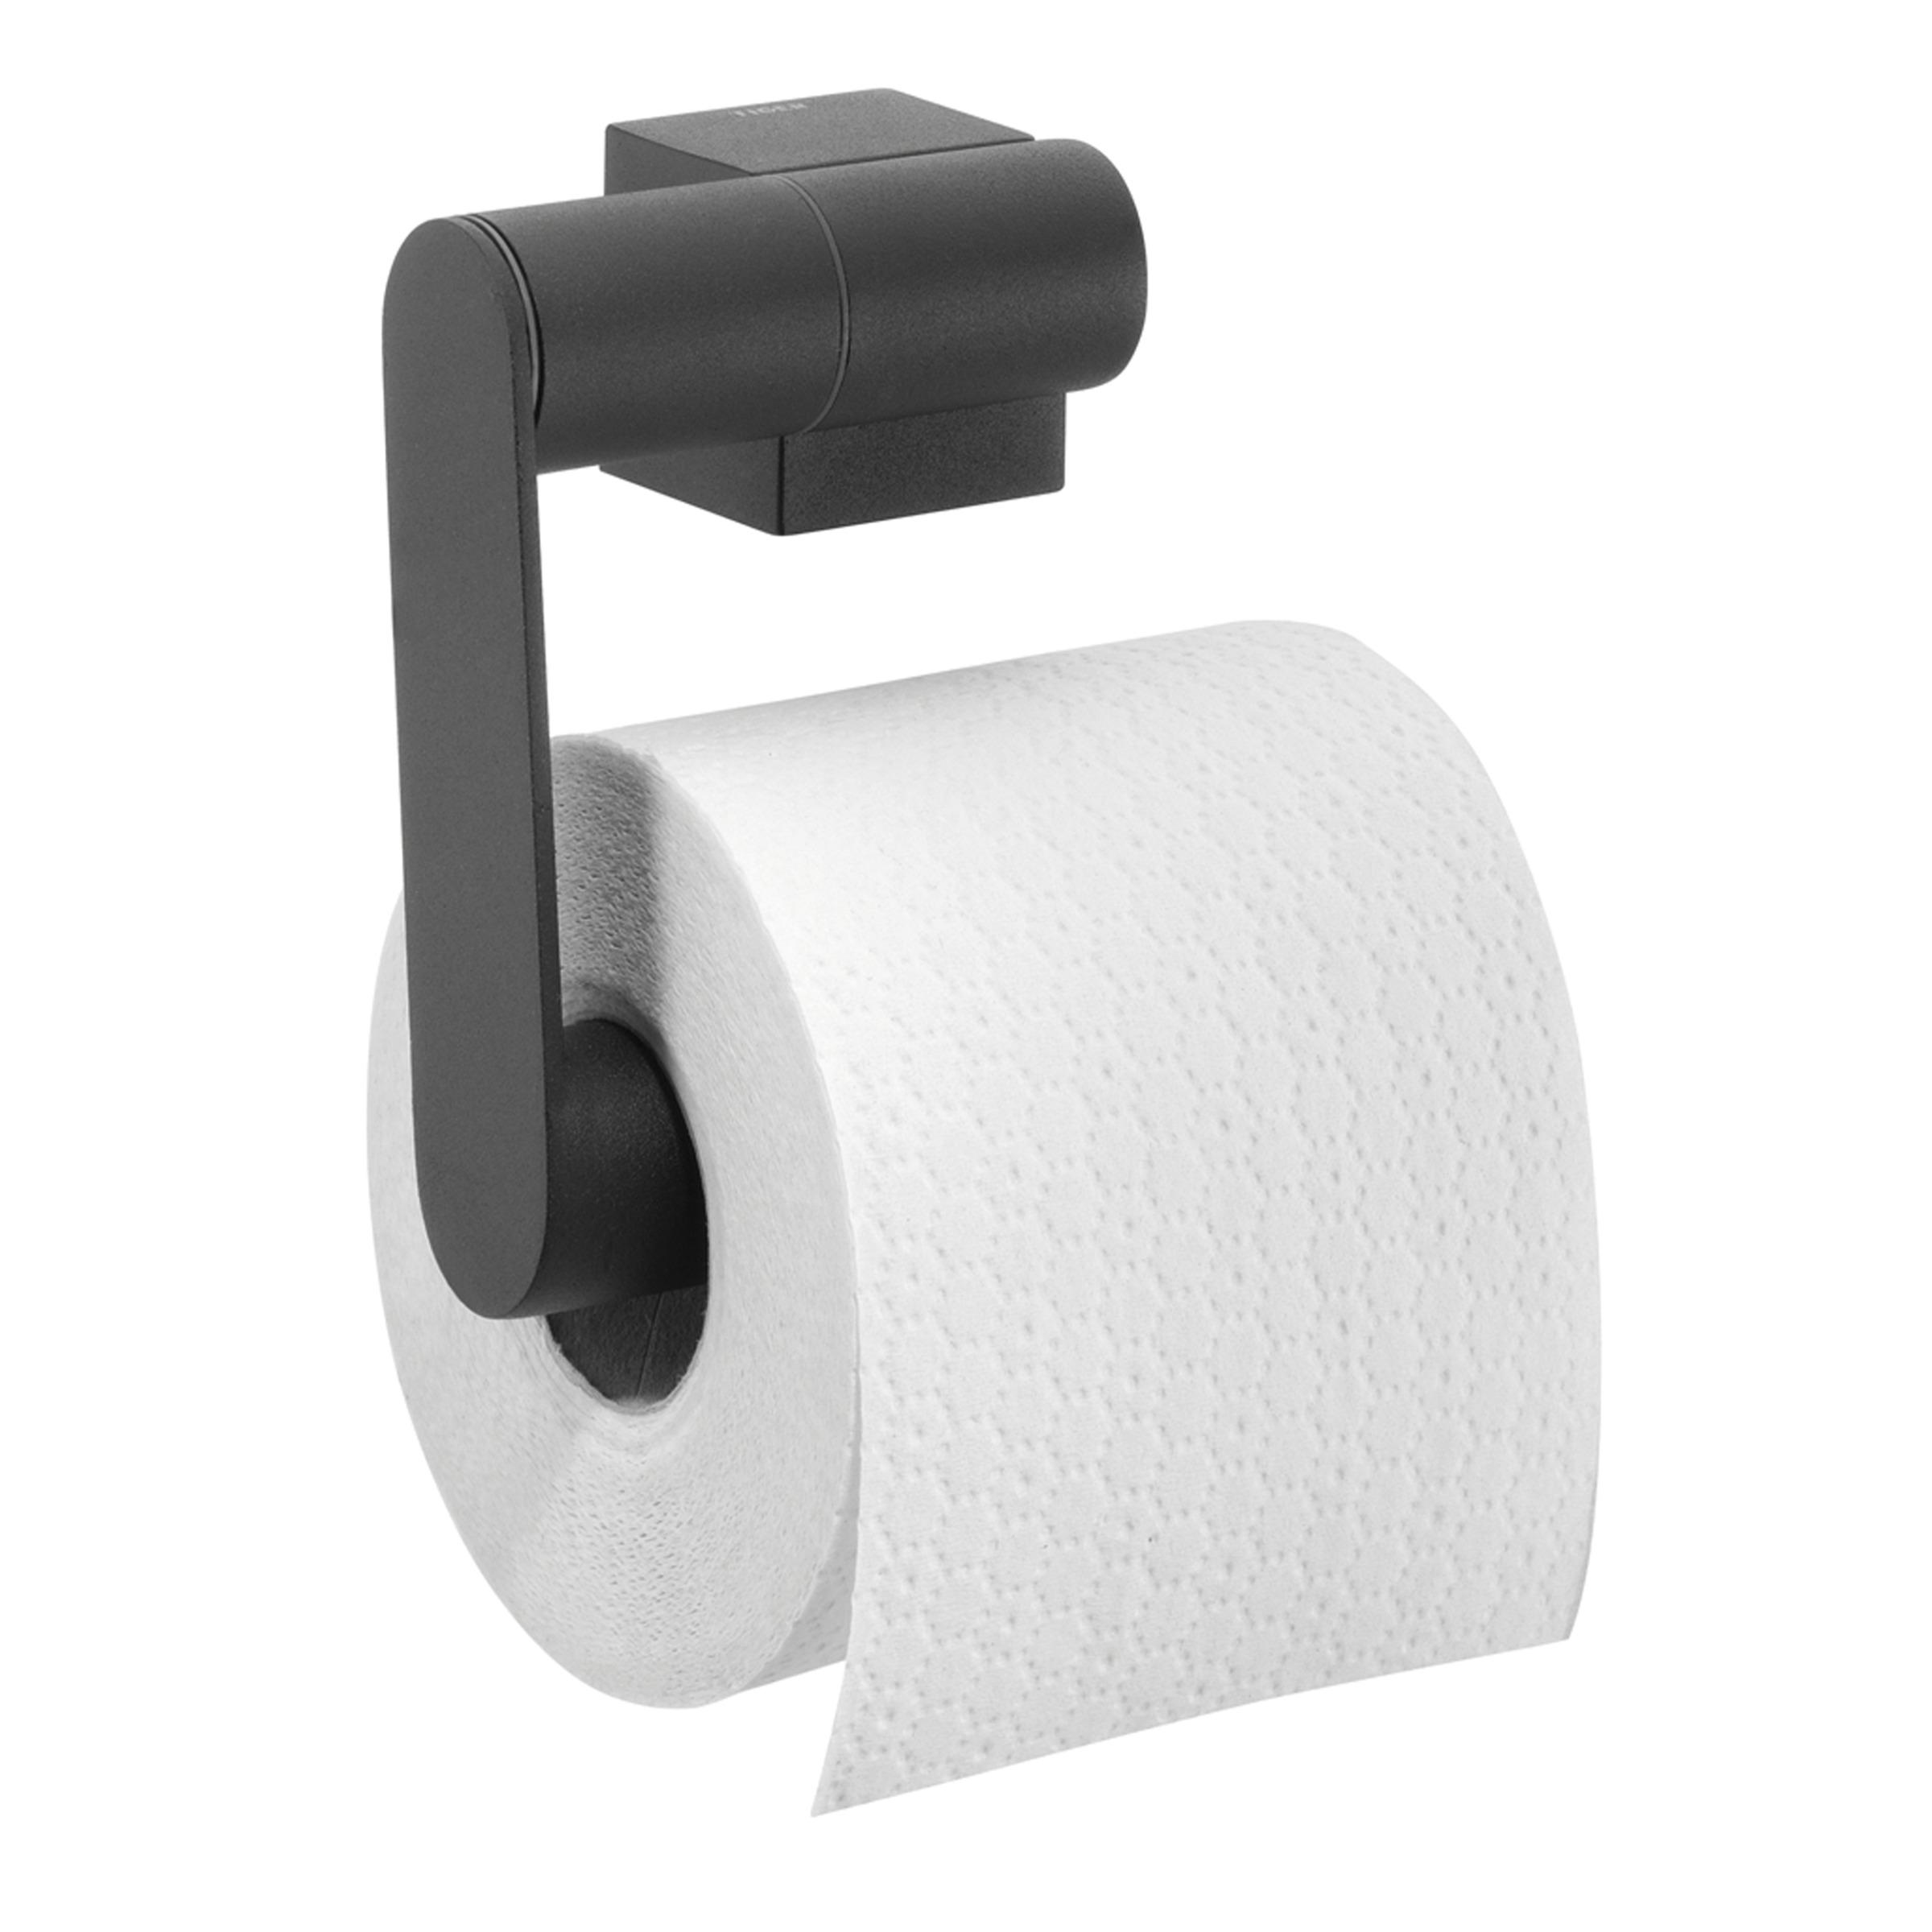 Tiger Nomad toiletrolhouder 12.5x11.5x5.5cm Metaal Zwart